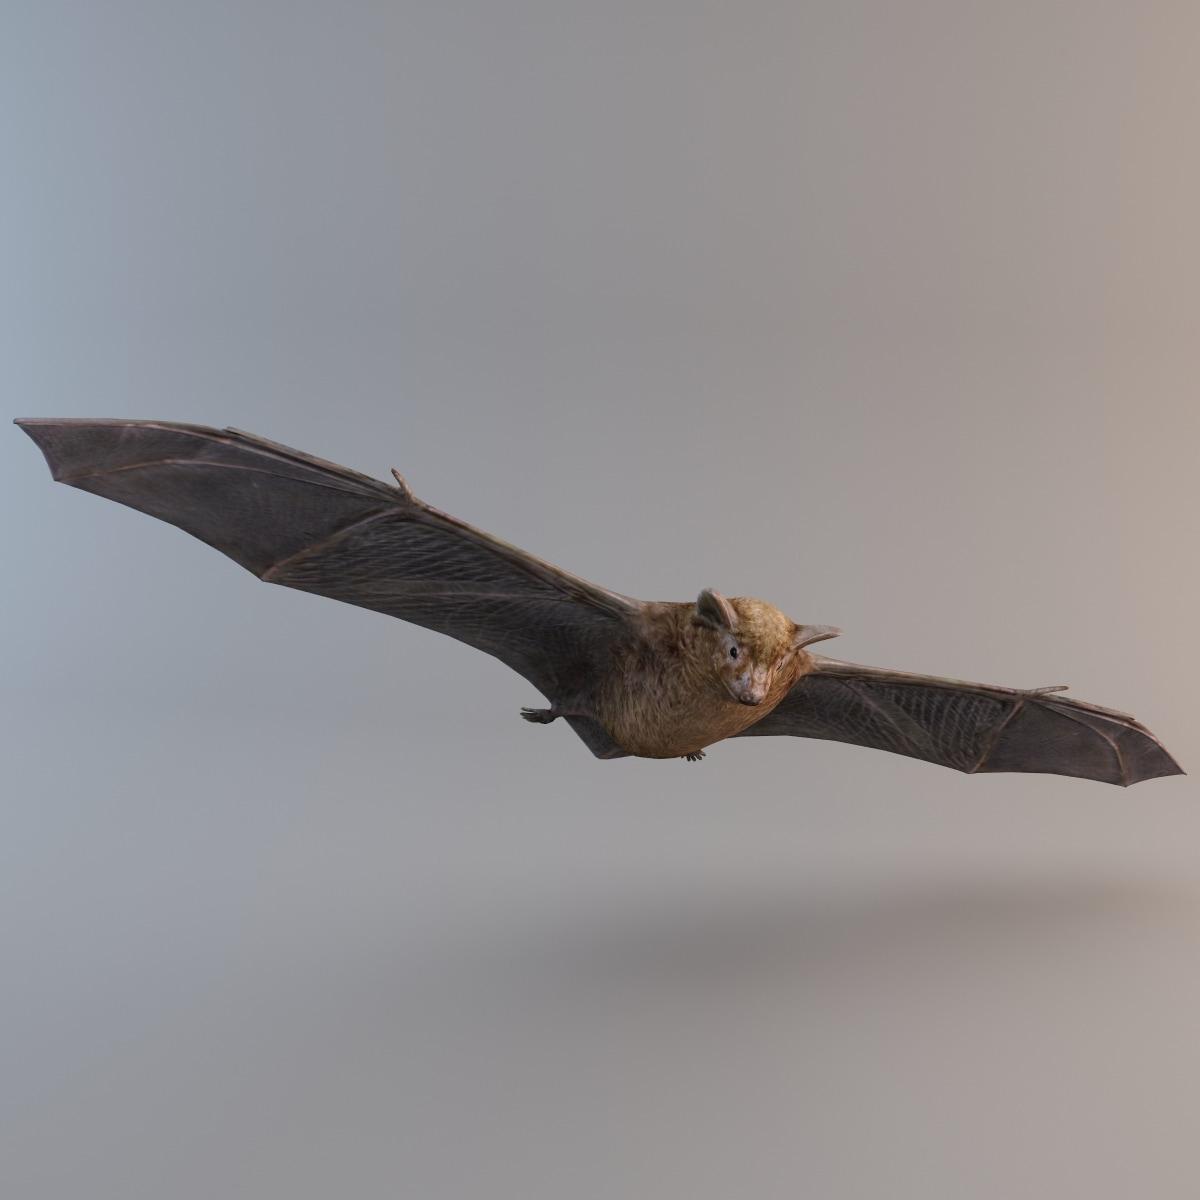 Brown_Bat_005.jpg